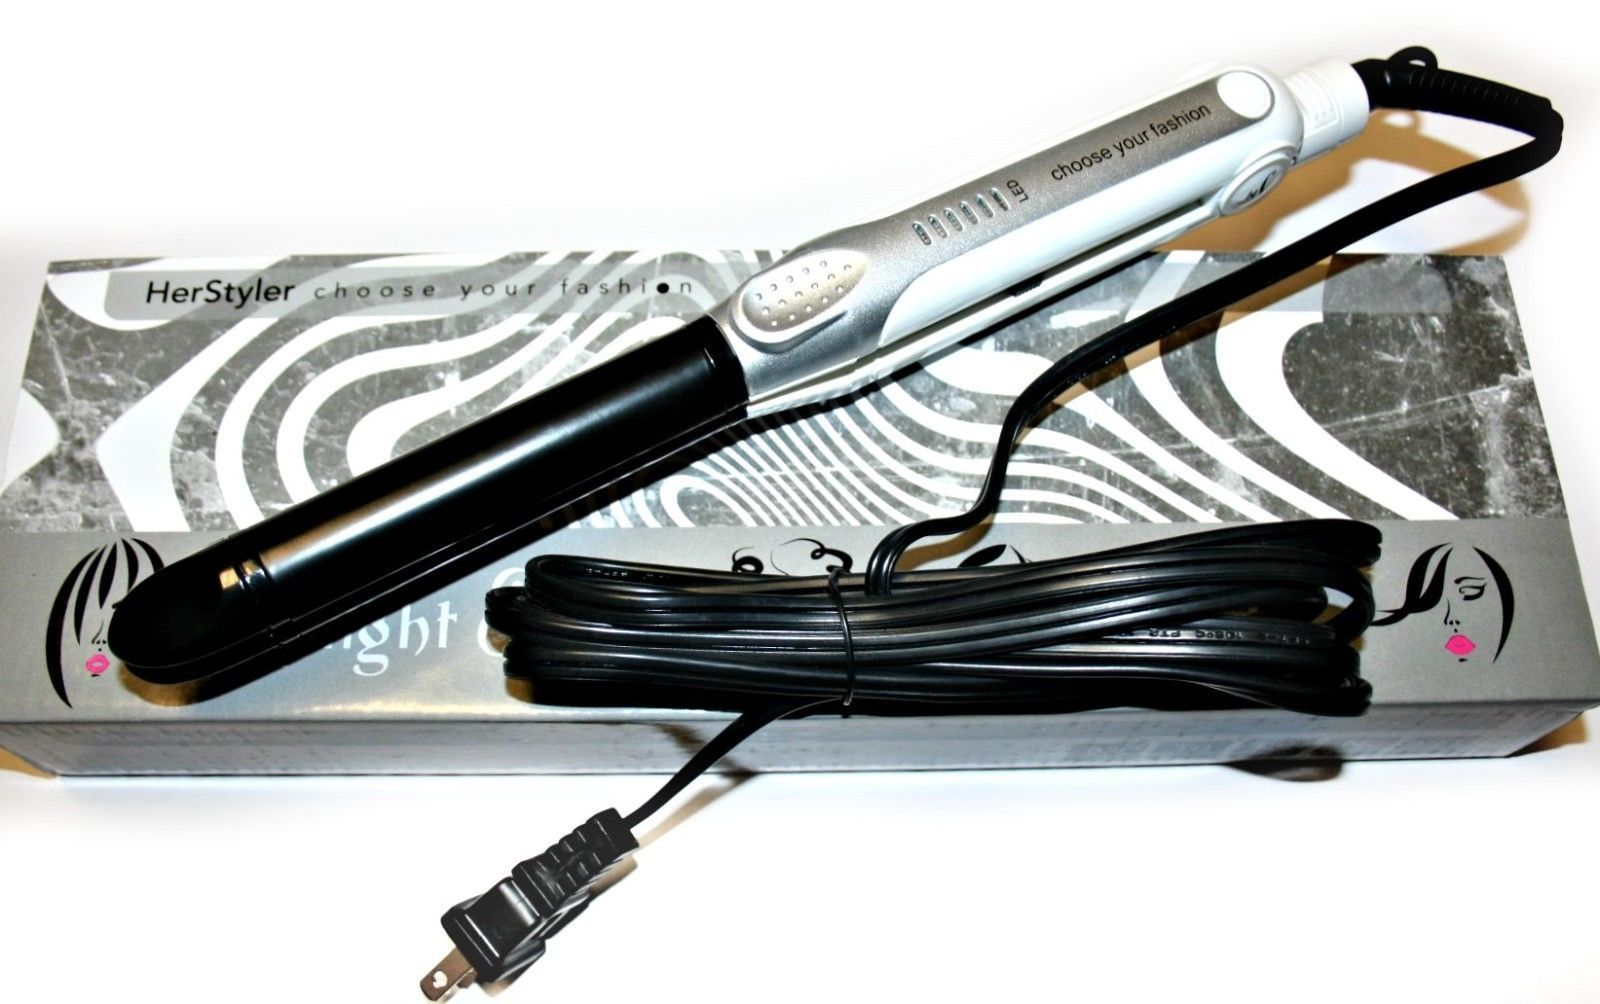 Herstyler Straight & Curl Styling Iron Flat Iron, NIB - $23.99